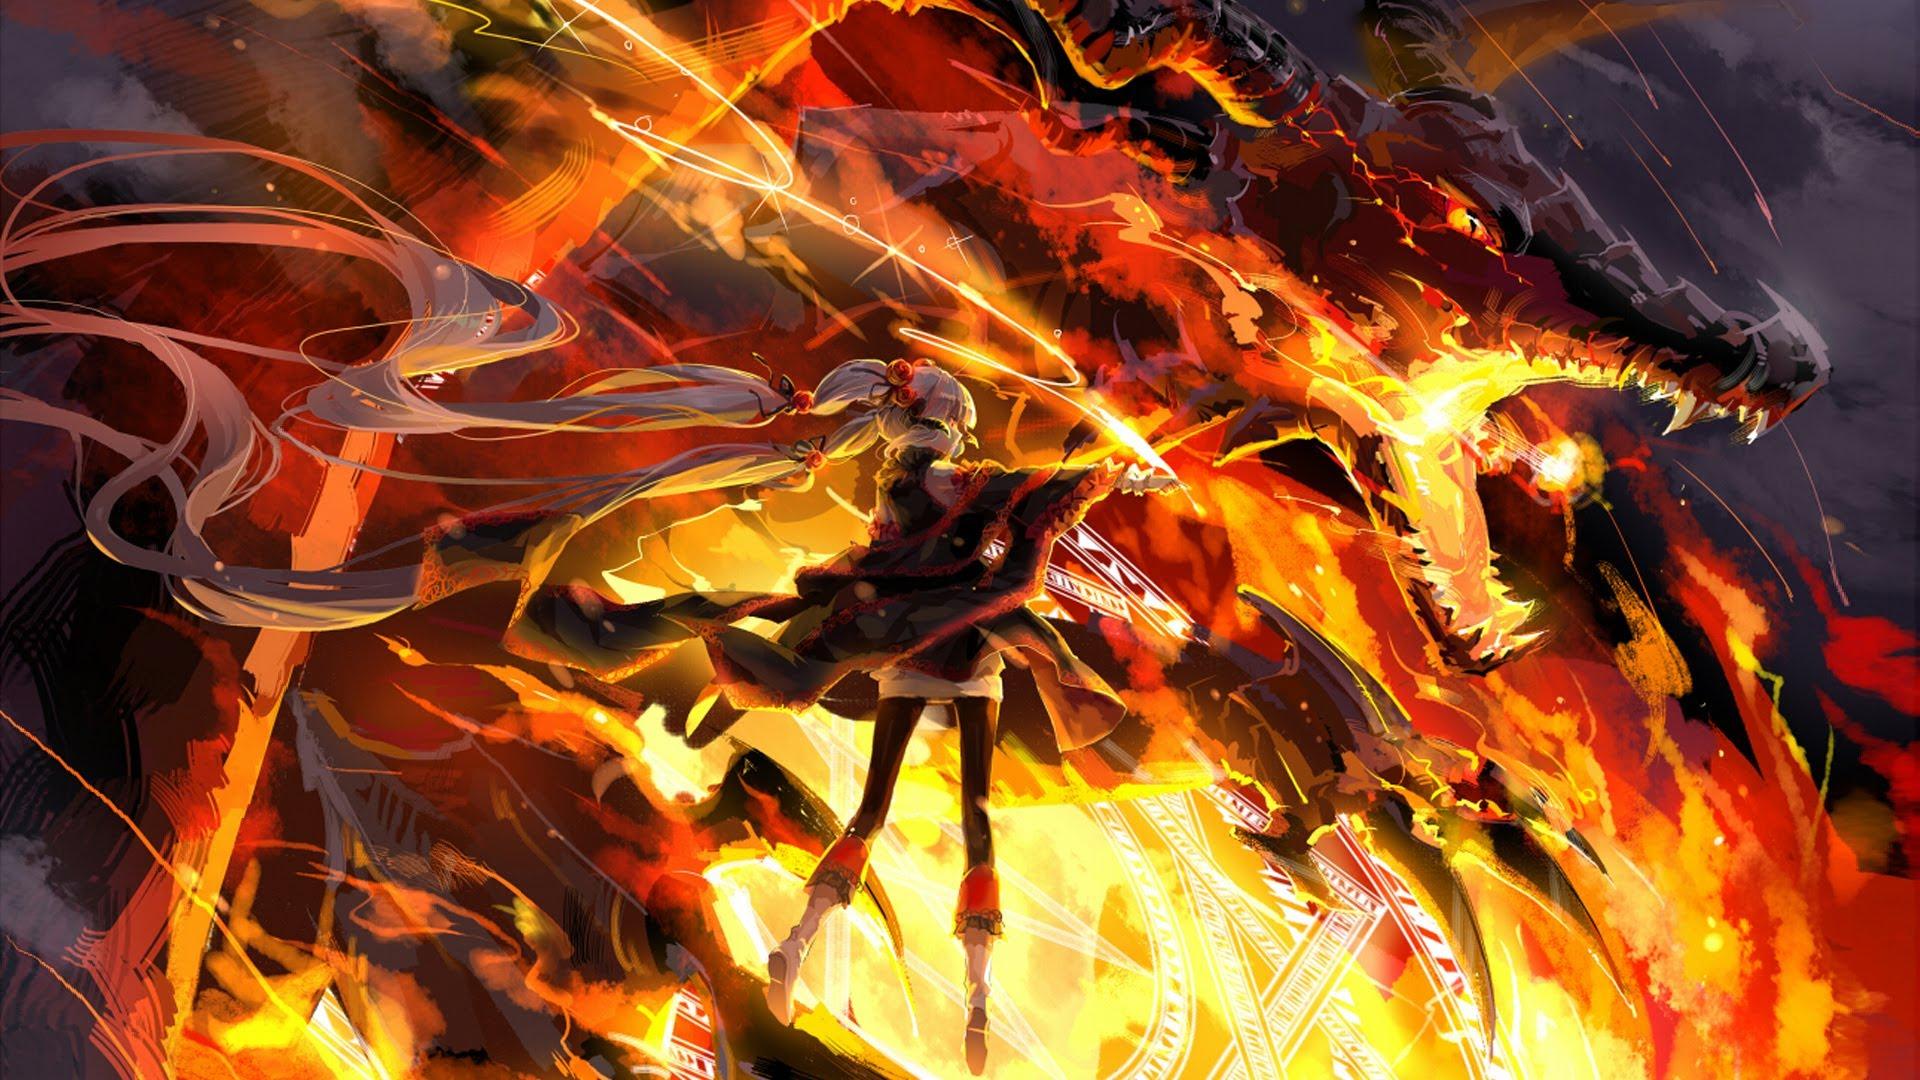 Ed-Sheeran-I-See-Fire-Kygo-Remix-wallpaper-wp3805022